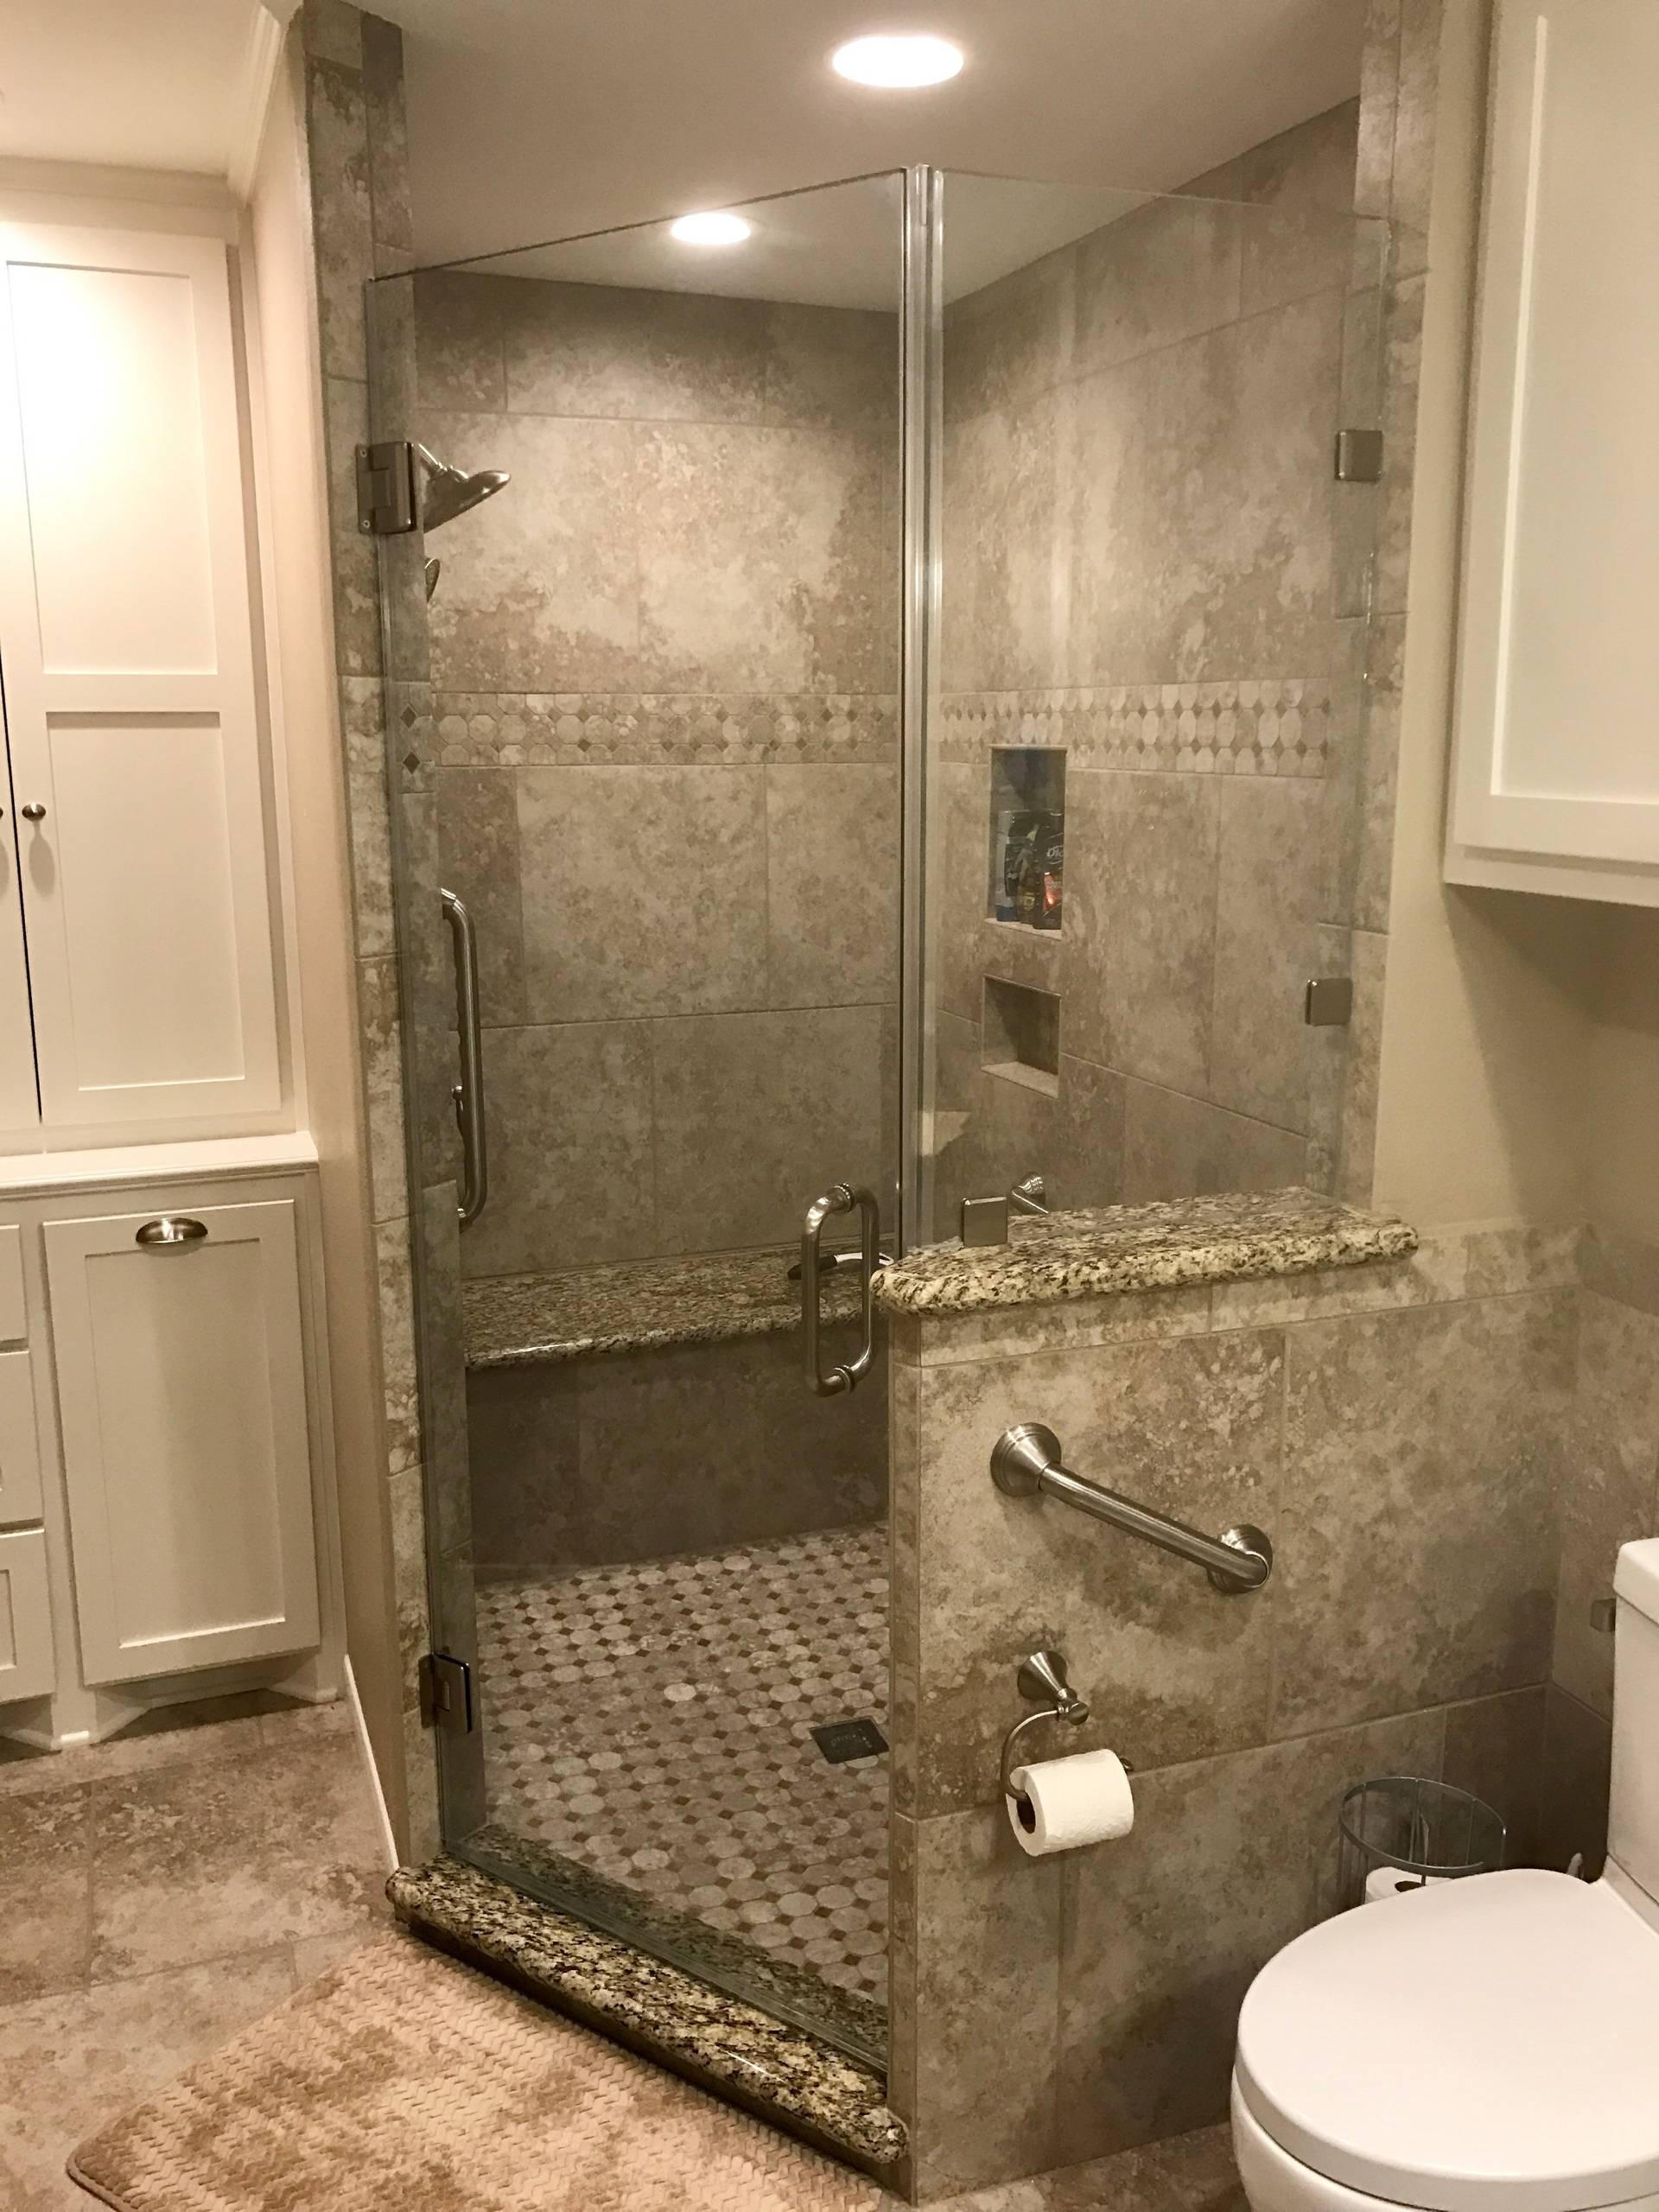 Brazoria Master Bathroom Remodel - 2017